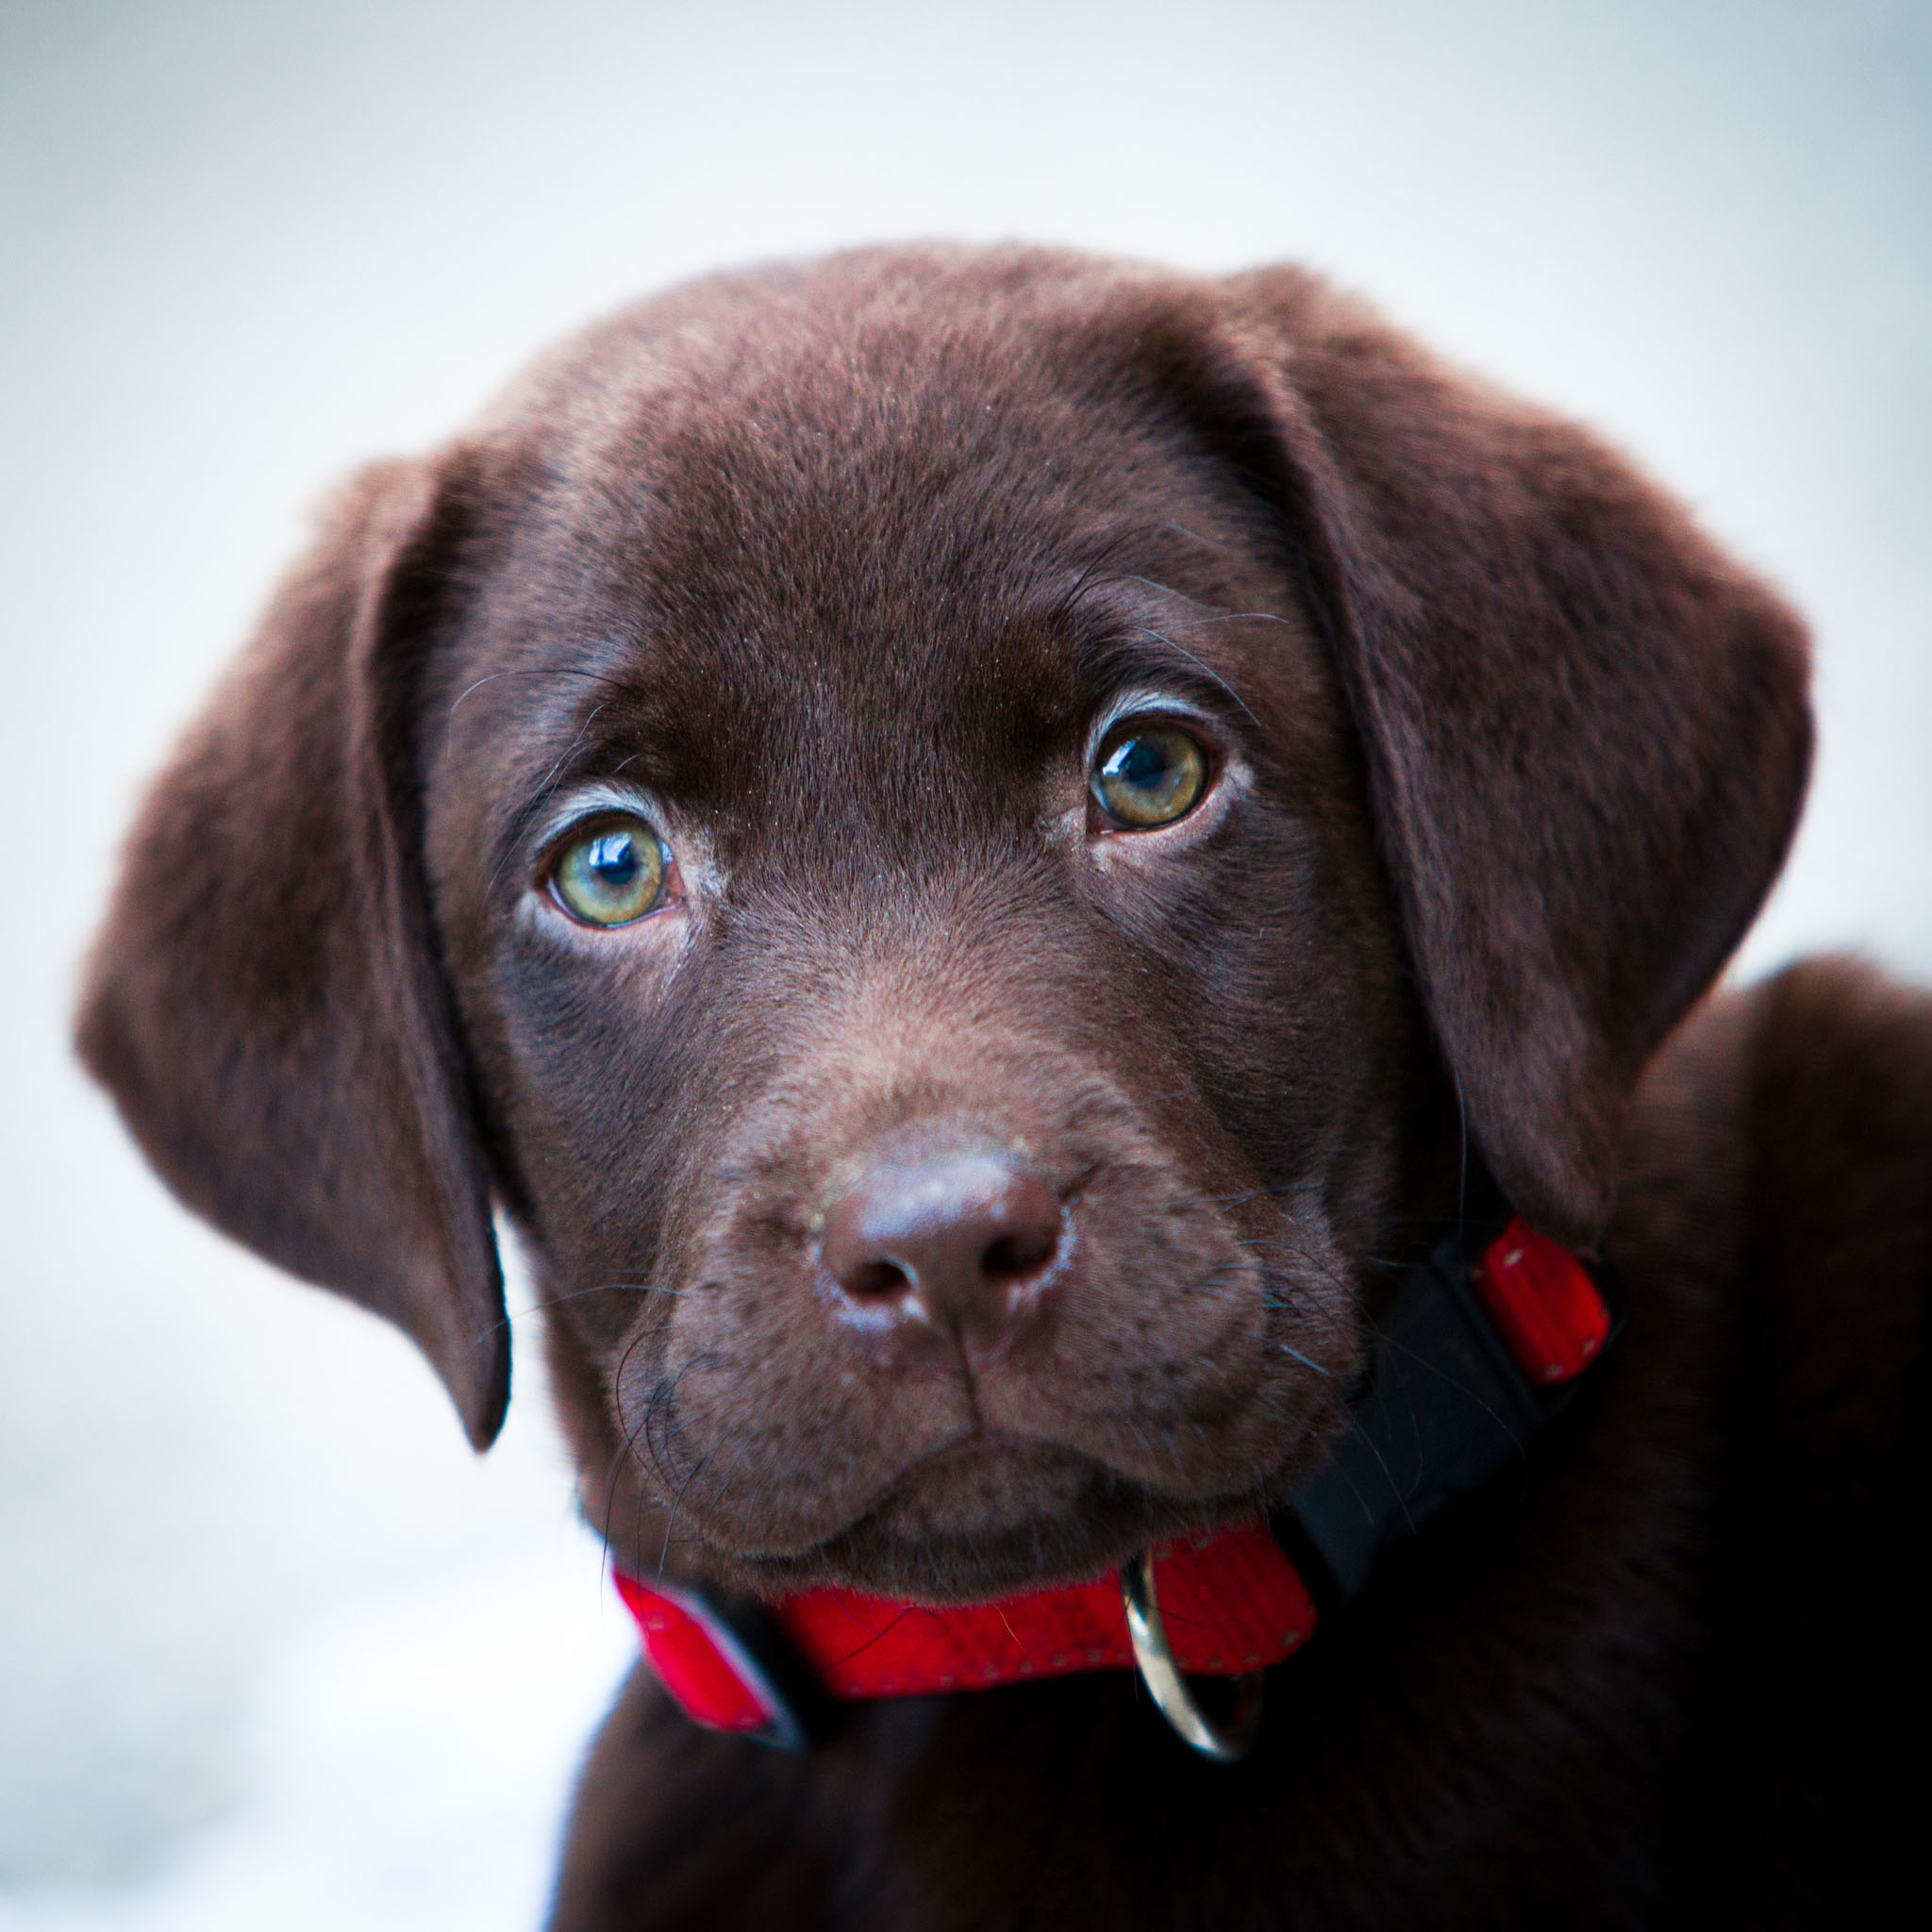 Pet portrait photography of a chocolate Labrador puppy in Lancaster, Lancashire